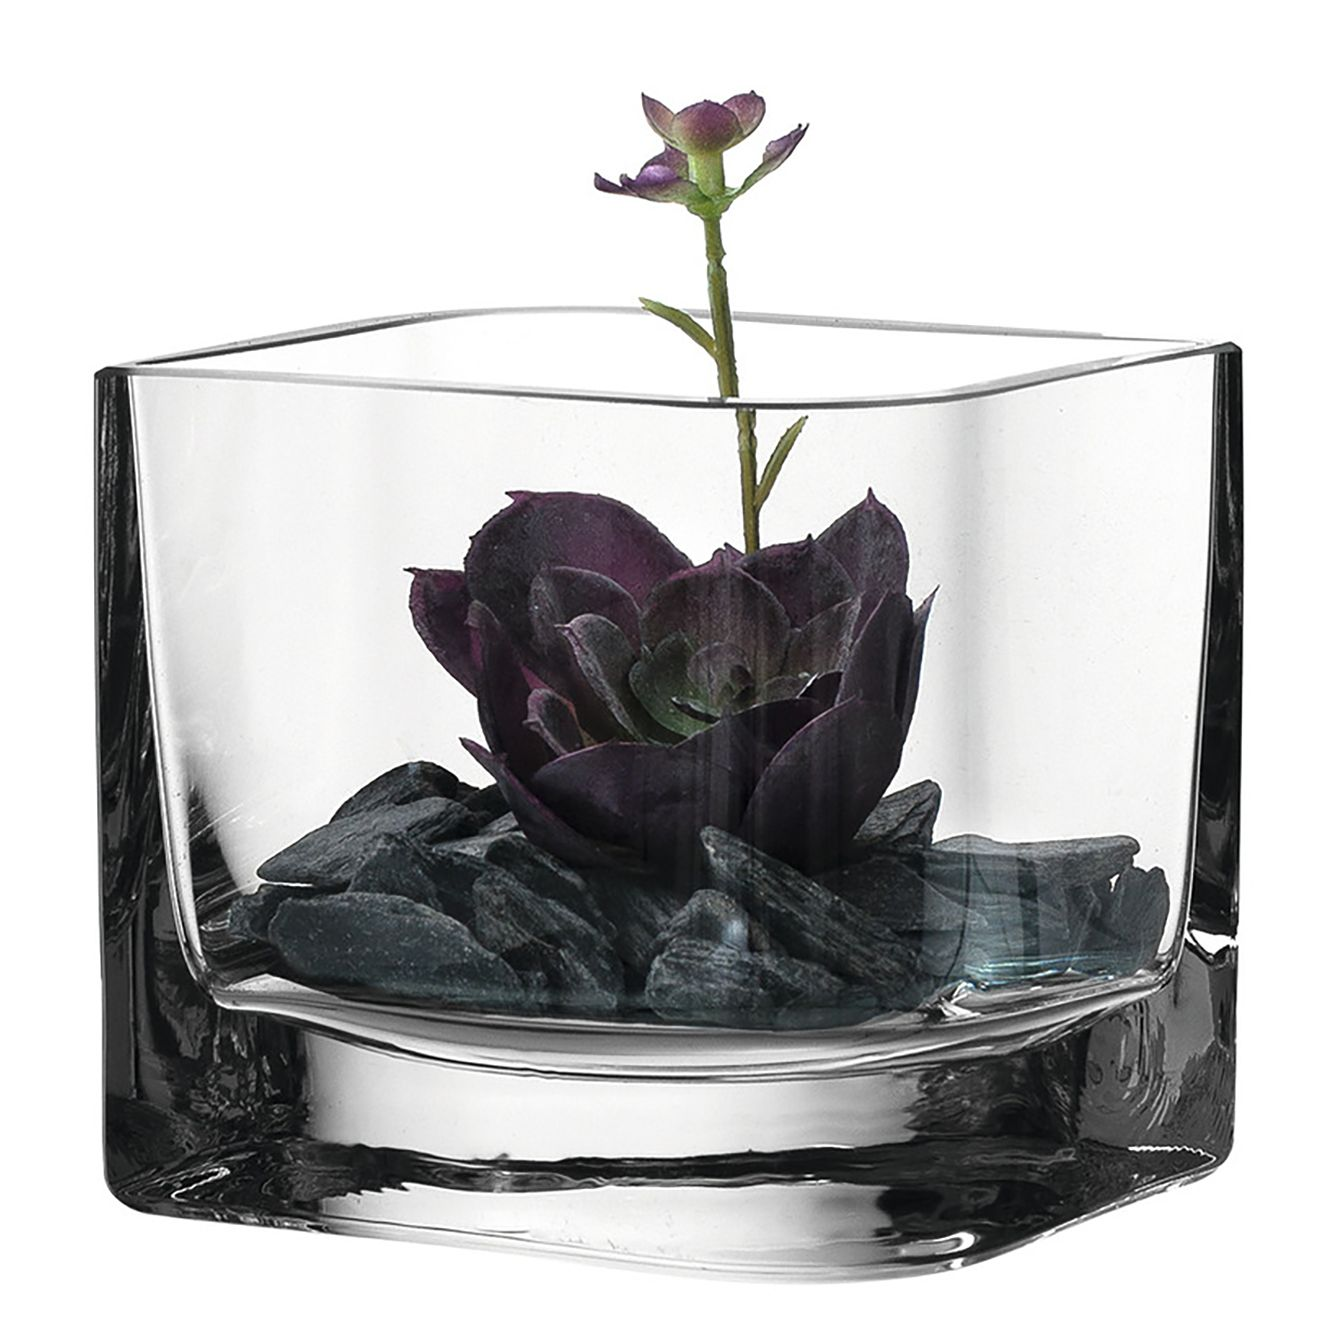 home24 Kunstpflanze Sukkulente Lucca I   Dekoration > Dekopflanzen > Kunstpflanzen   Weiss   Glas   Leonardo